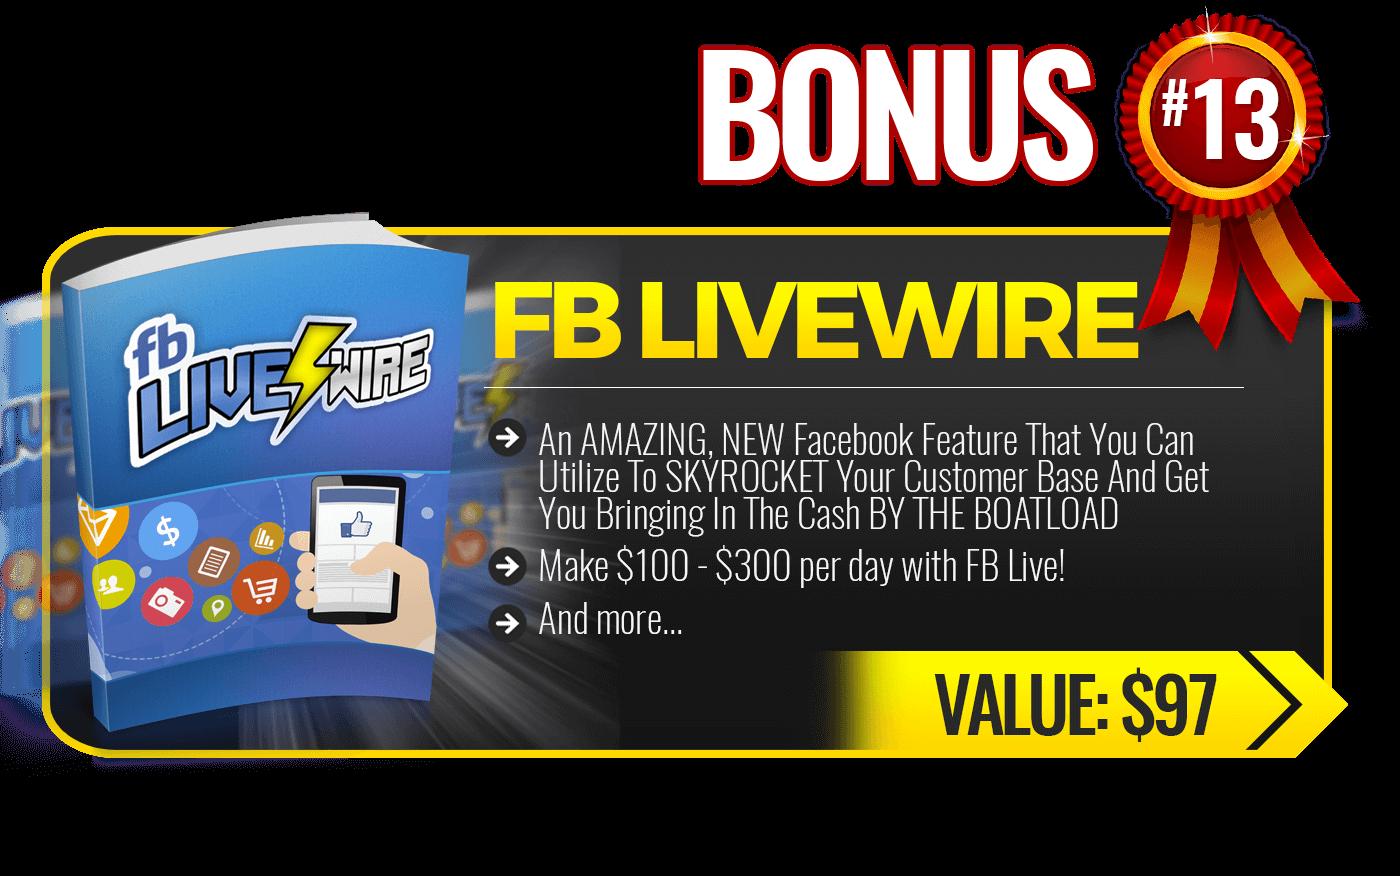 13. FB Live Swire